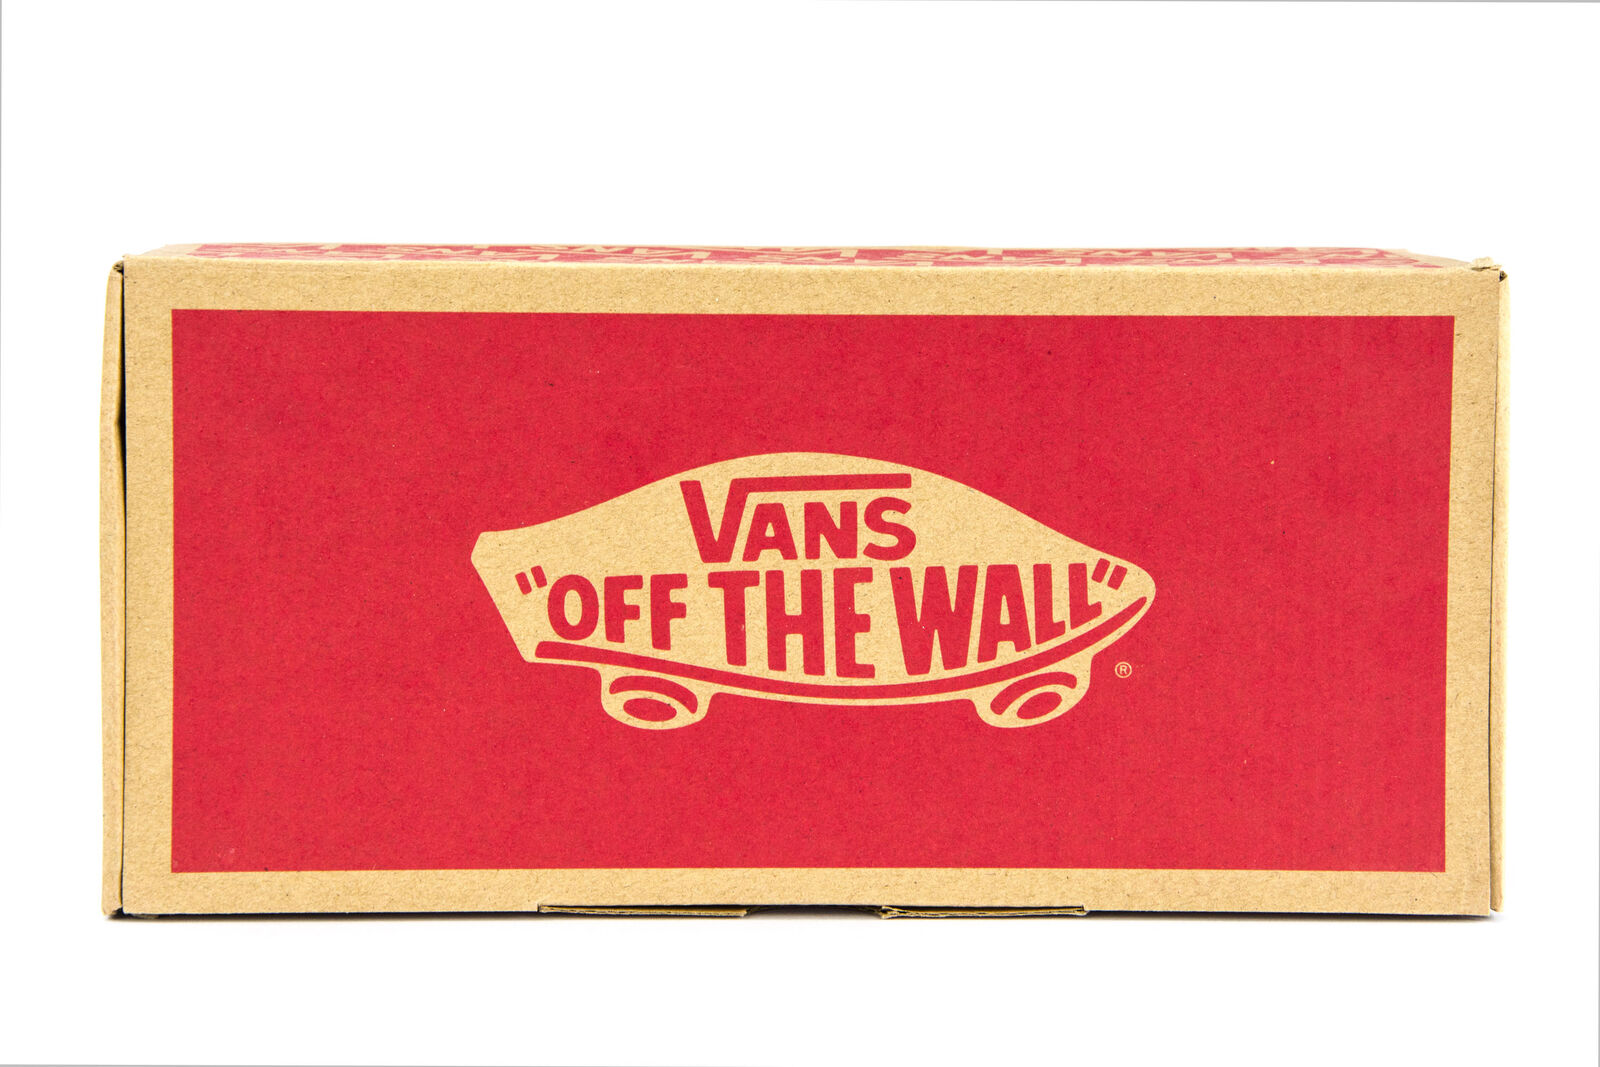 VANS Damen Schuhe Sneakers AUTHENTIC Stoff (KENDRA DANDY) Weiß Gedruckt Stoff AUTHENTIC 2610db